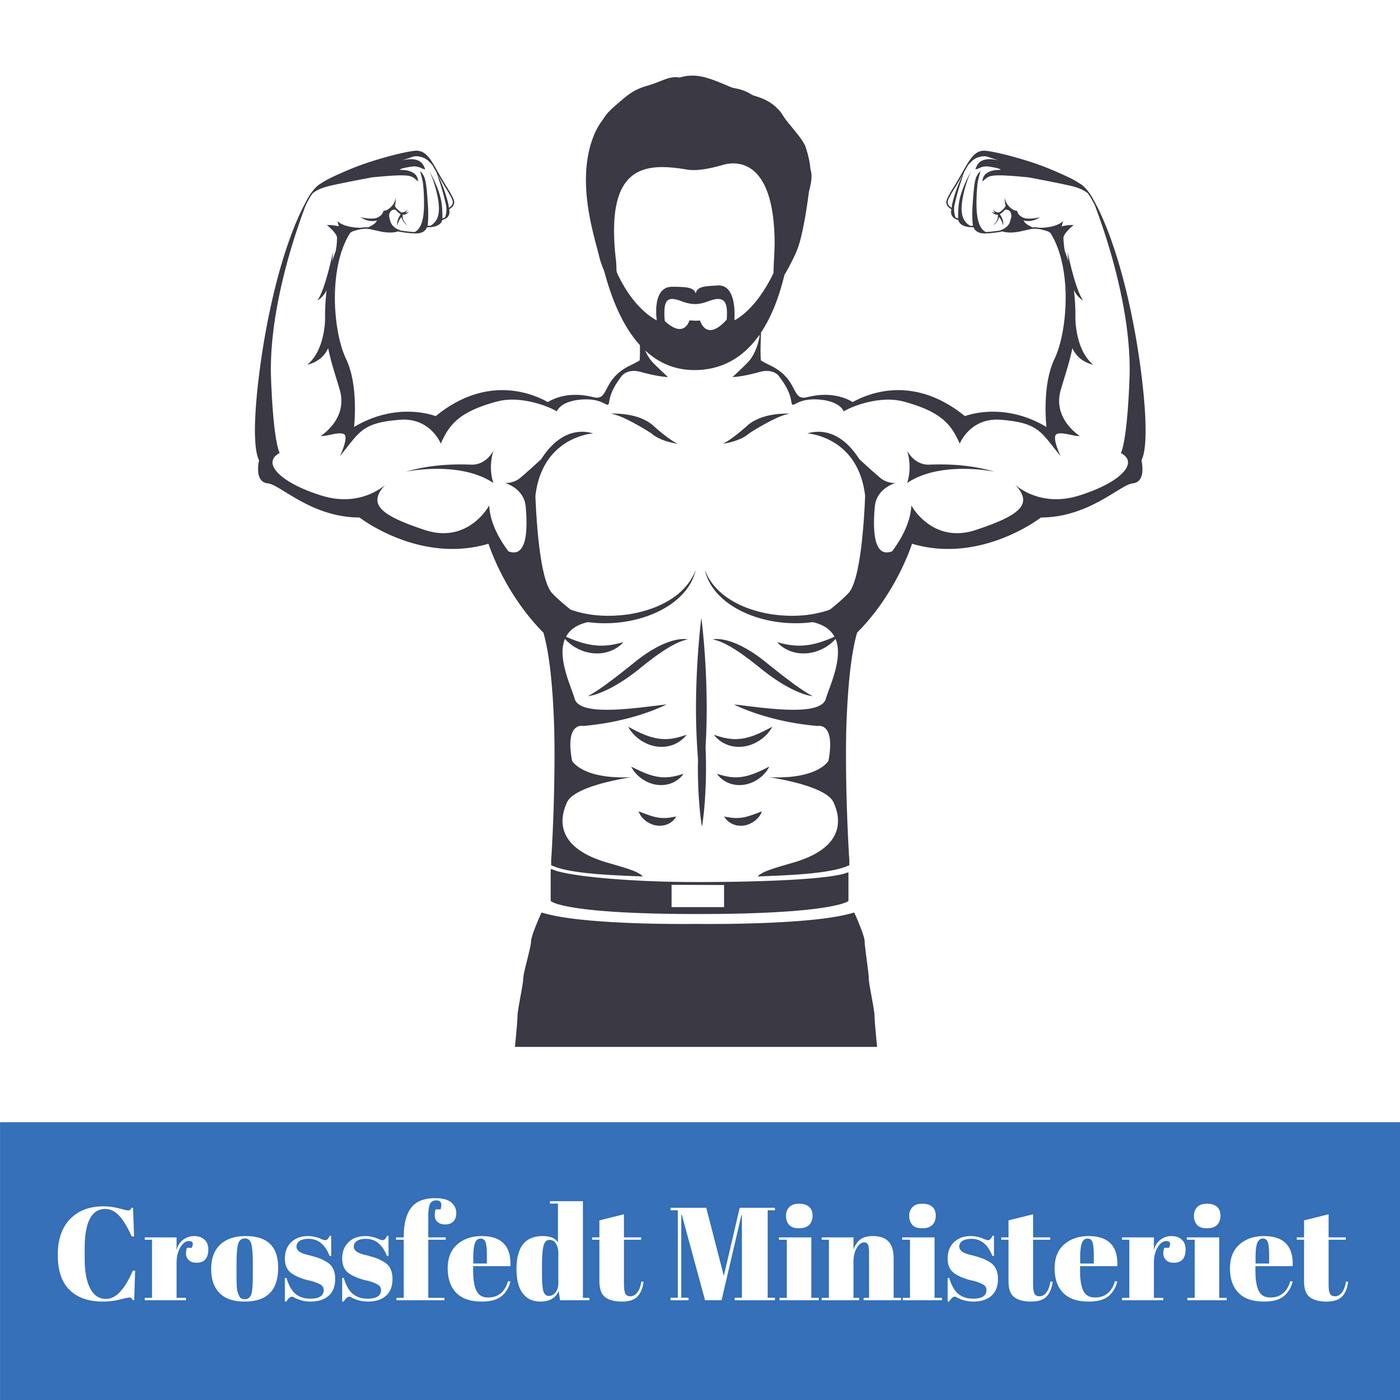 Crossfedt Ministeriet